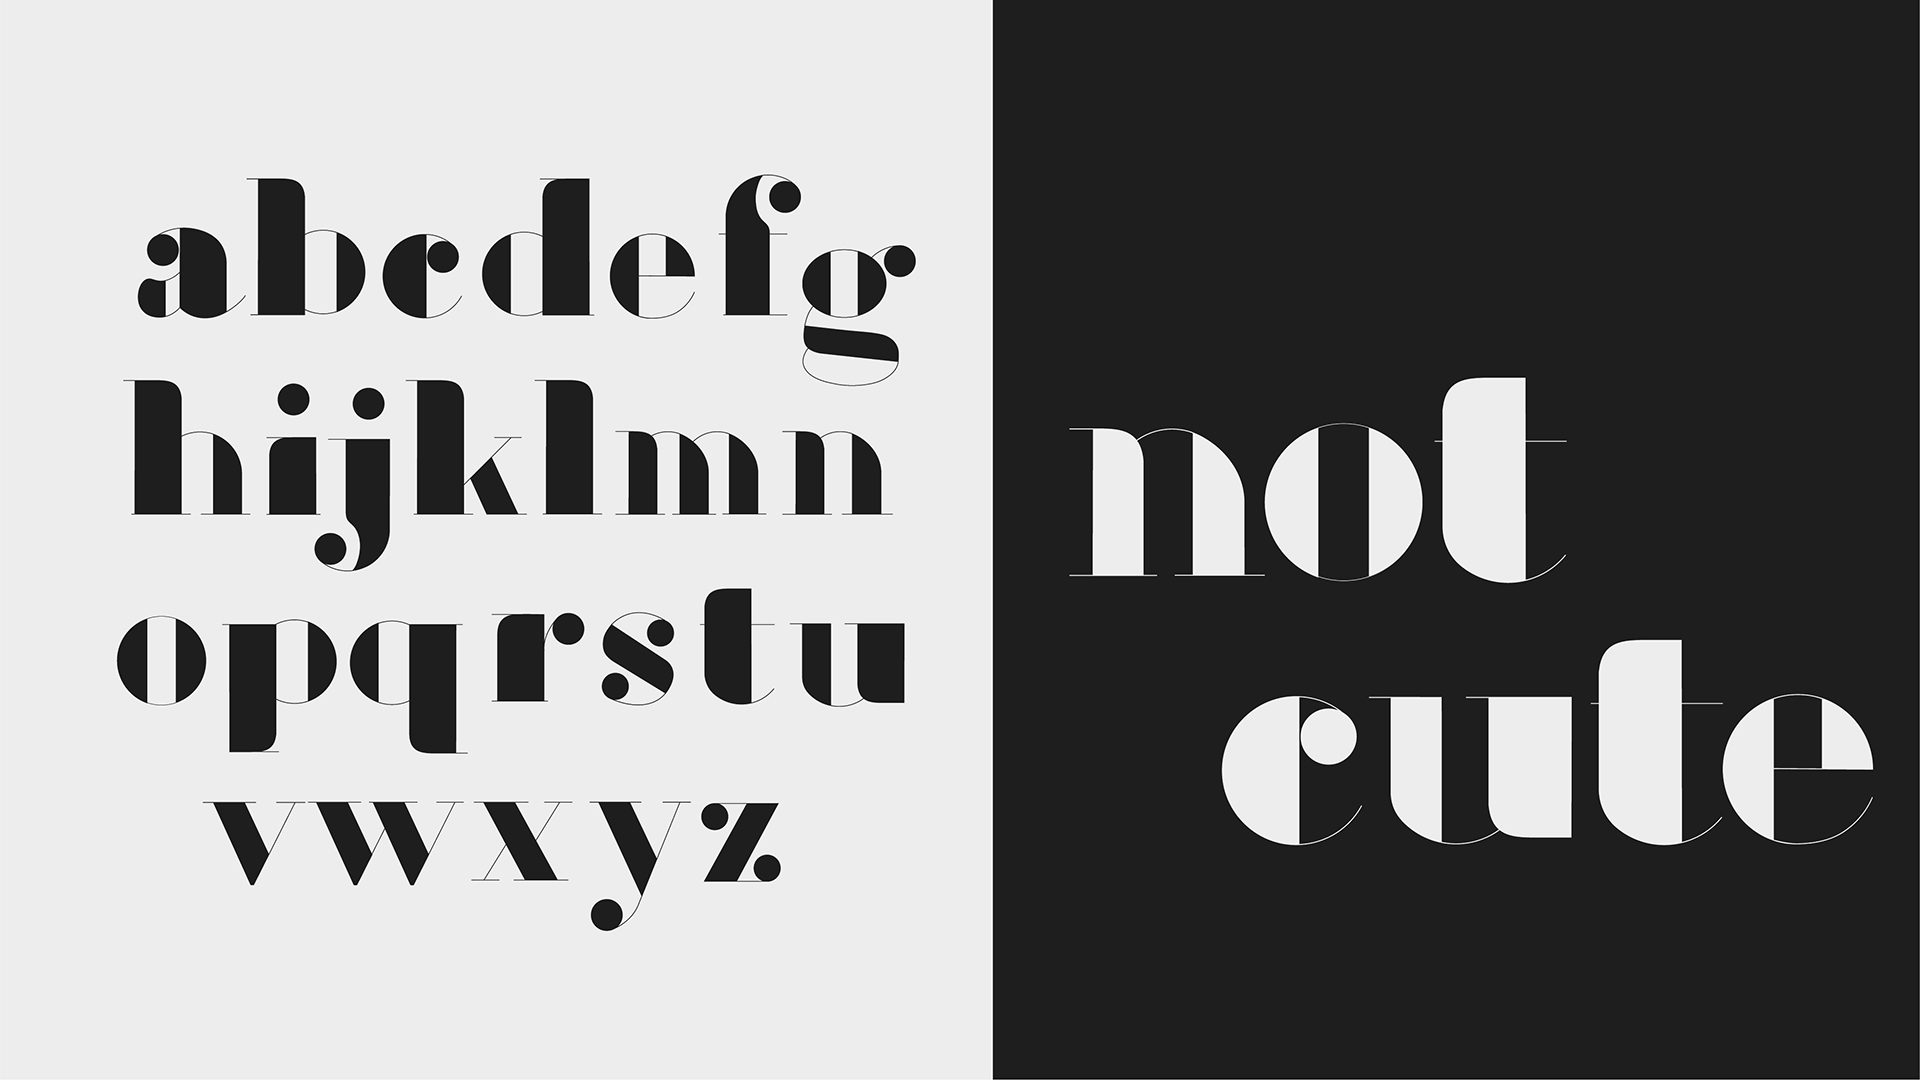 custom serif typeface in black and white